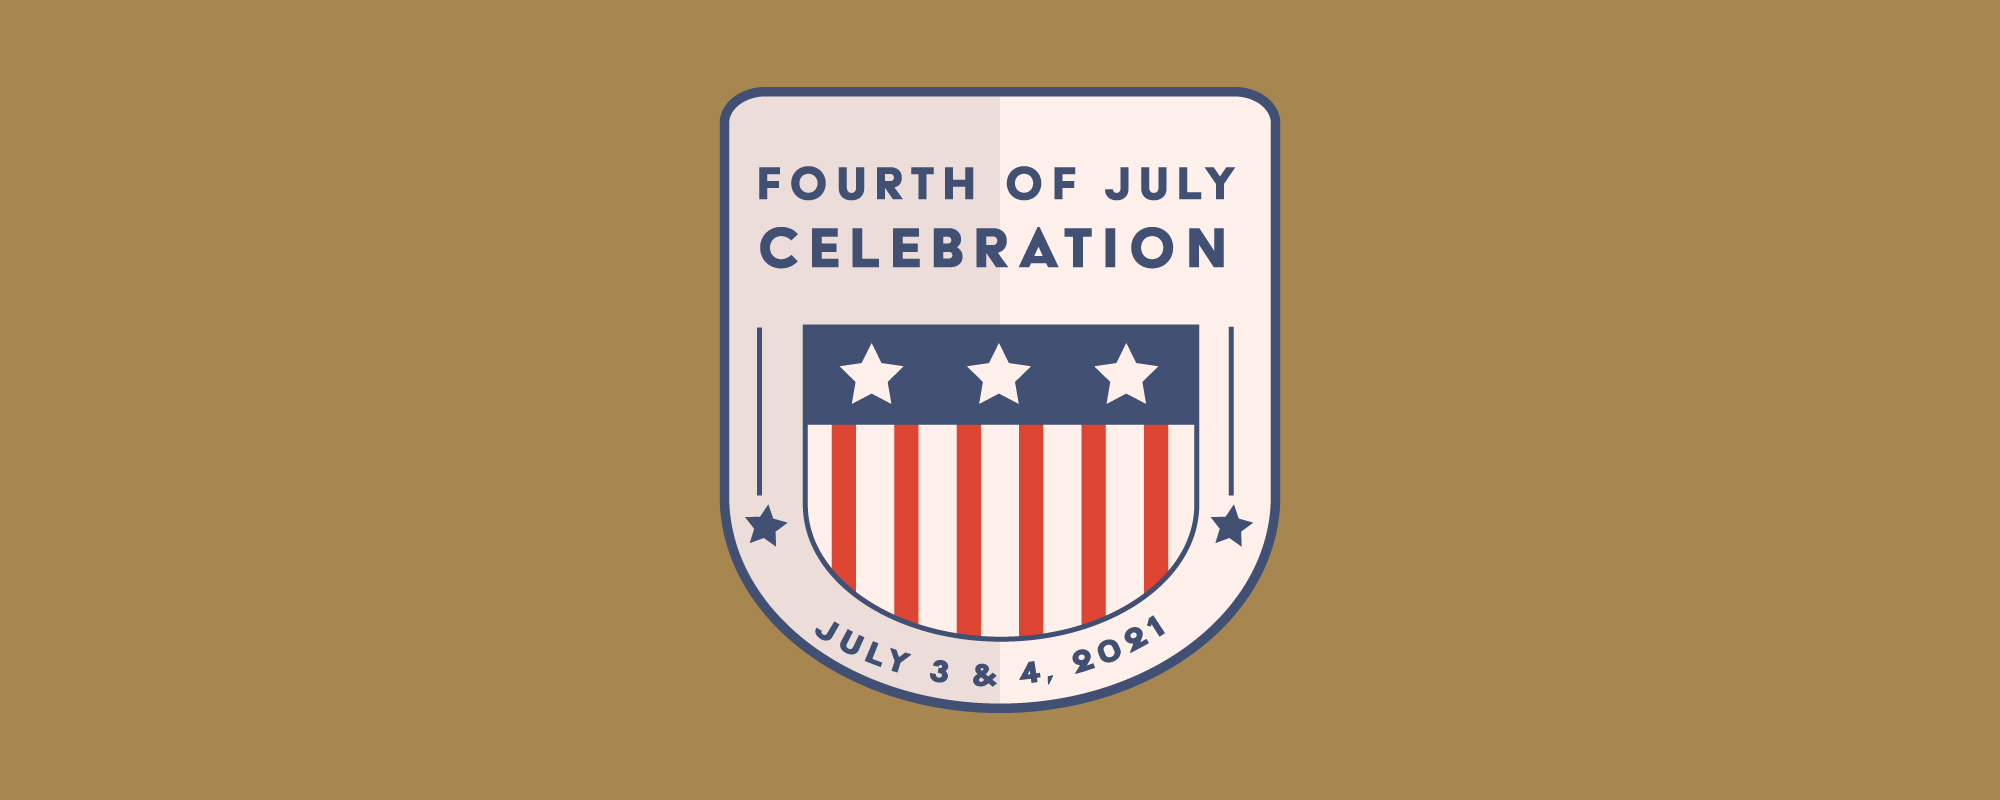 Fourth Of July Celebration 2021